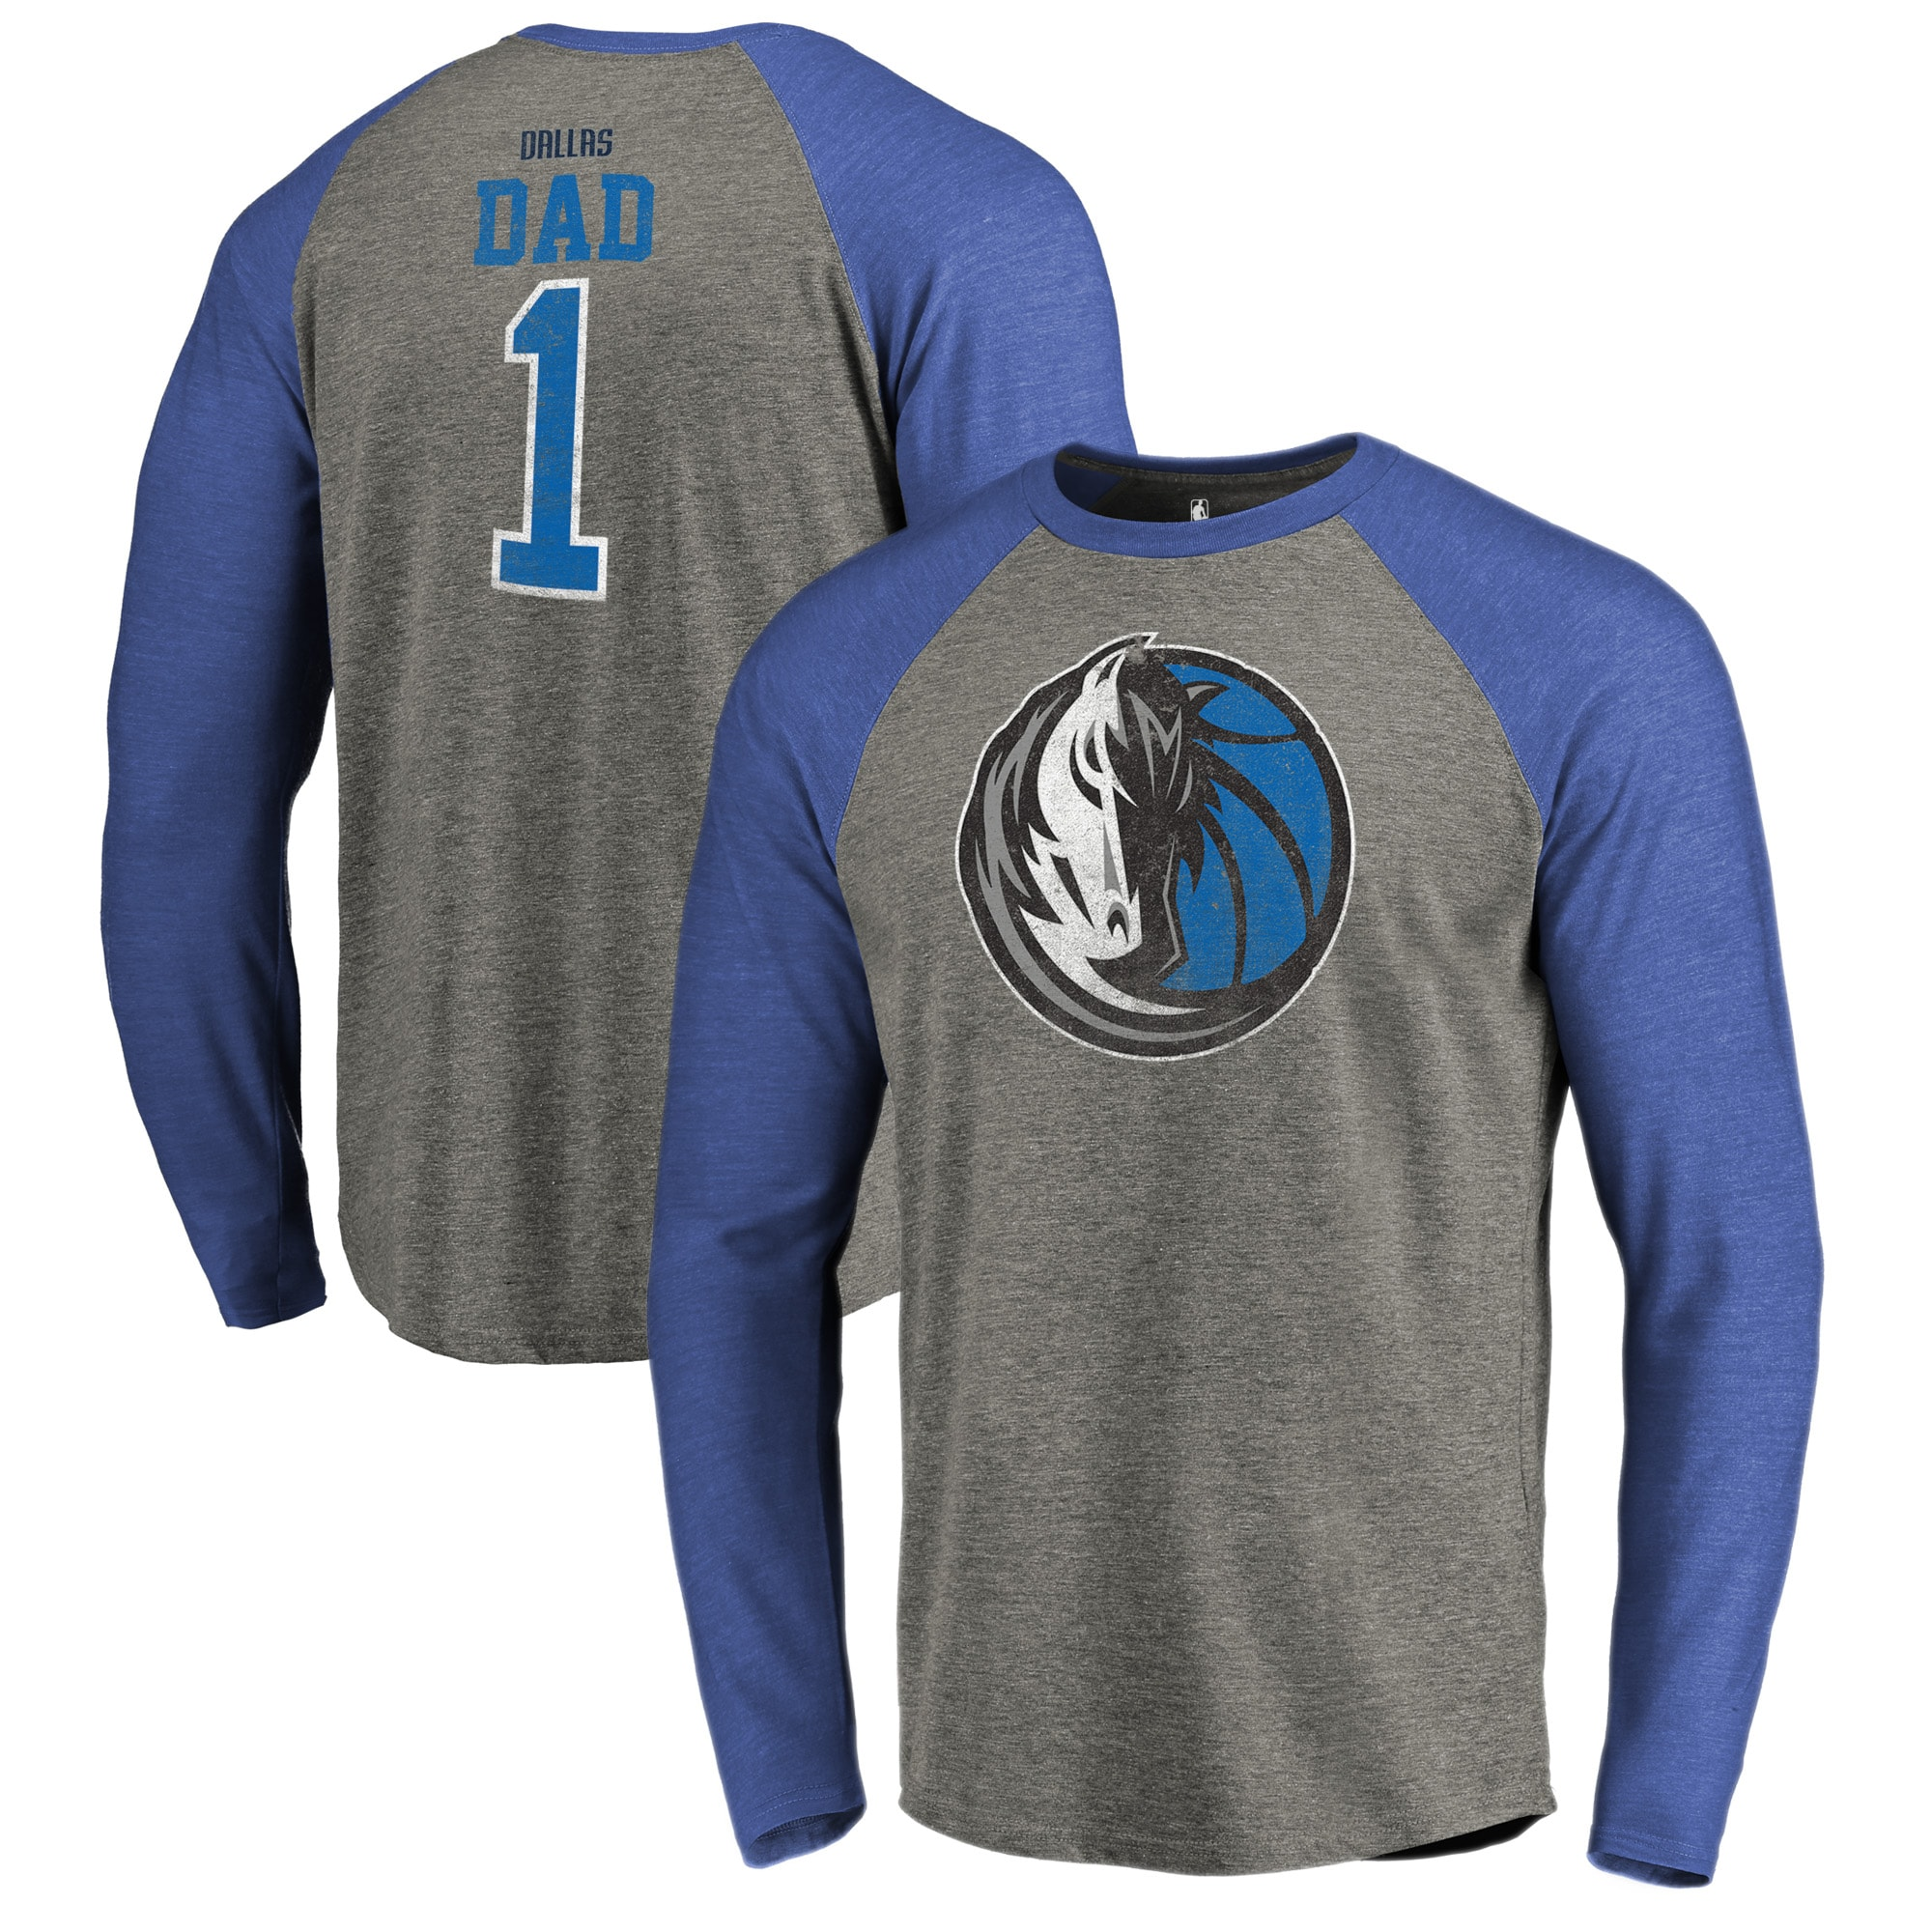 Dallas Mavericks Fanatics Branded Greatest Dad Long Sleeve Tri-Blend Raglan T-Shirt - Heathered Gray